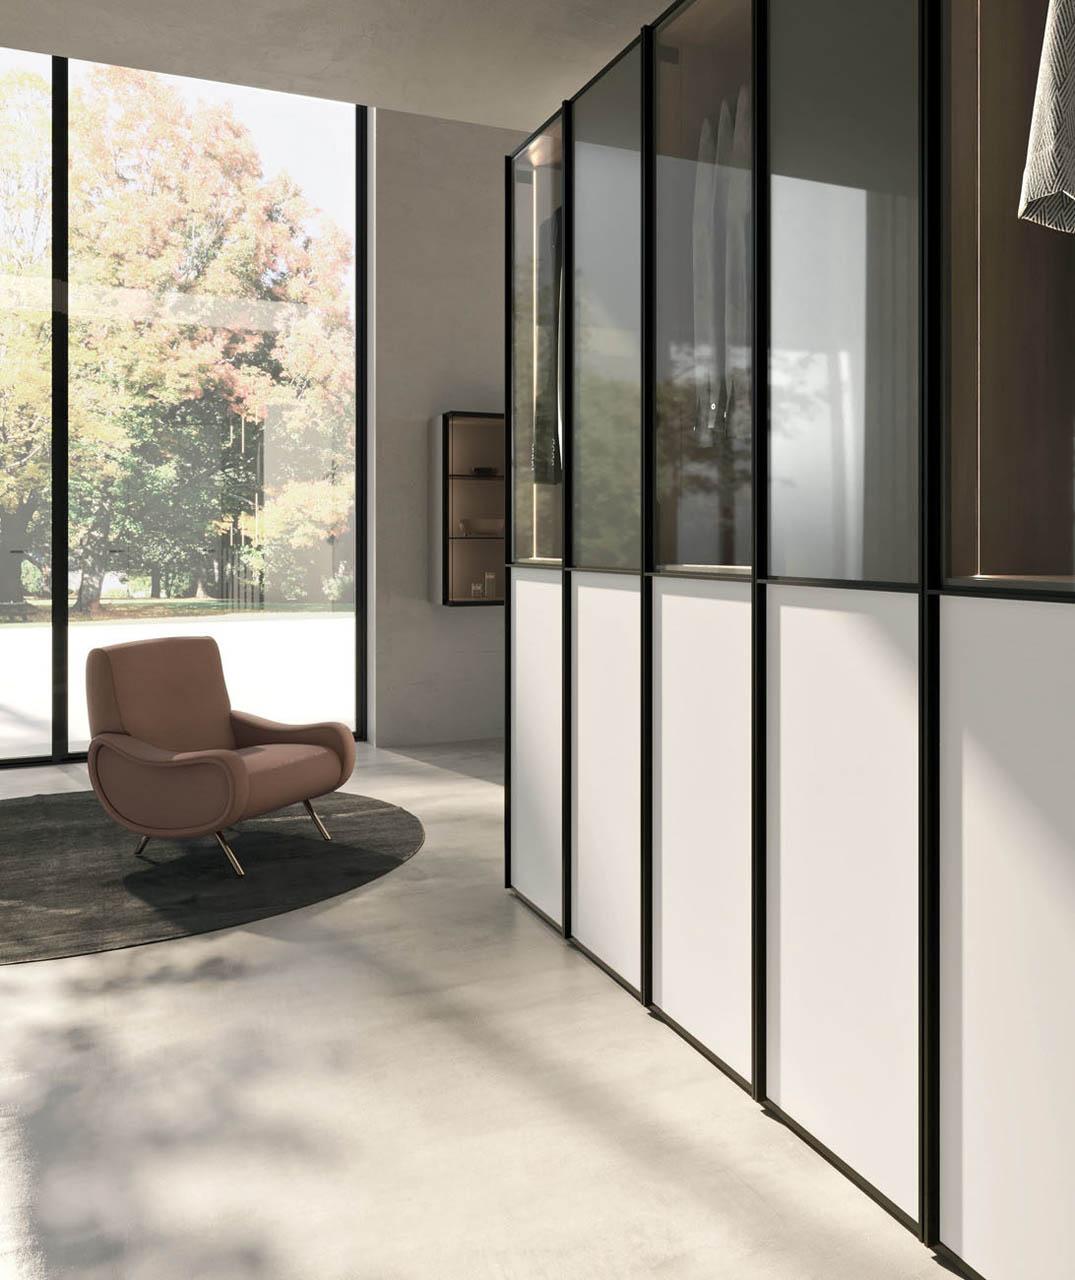 armadio-battente-anta-glass-4-orme-1092x1300